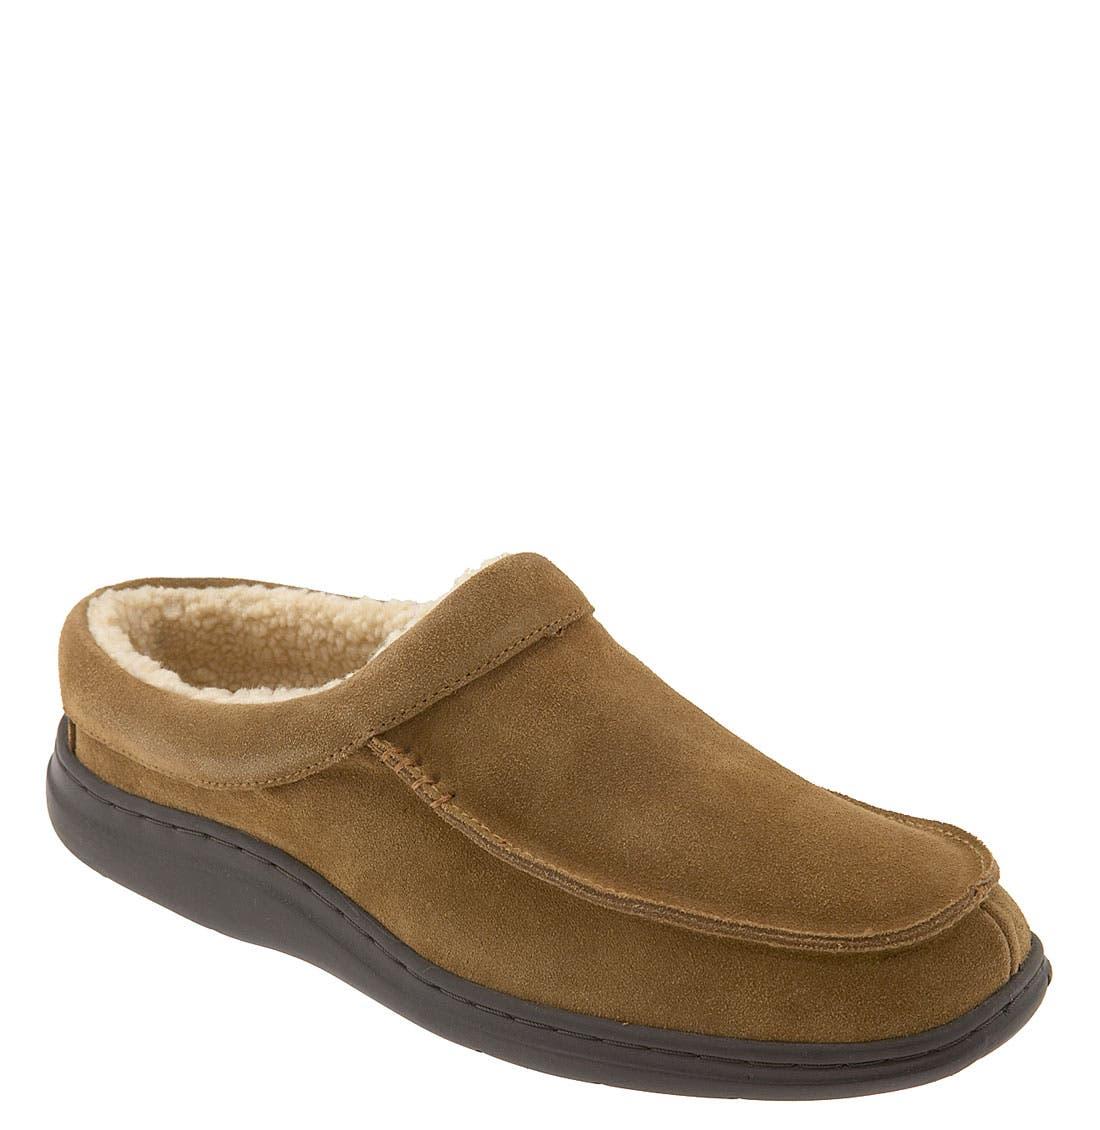 'Edmonton' Slipper,                         Main,                         color, Tan